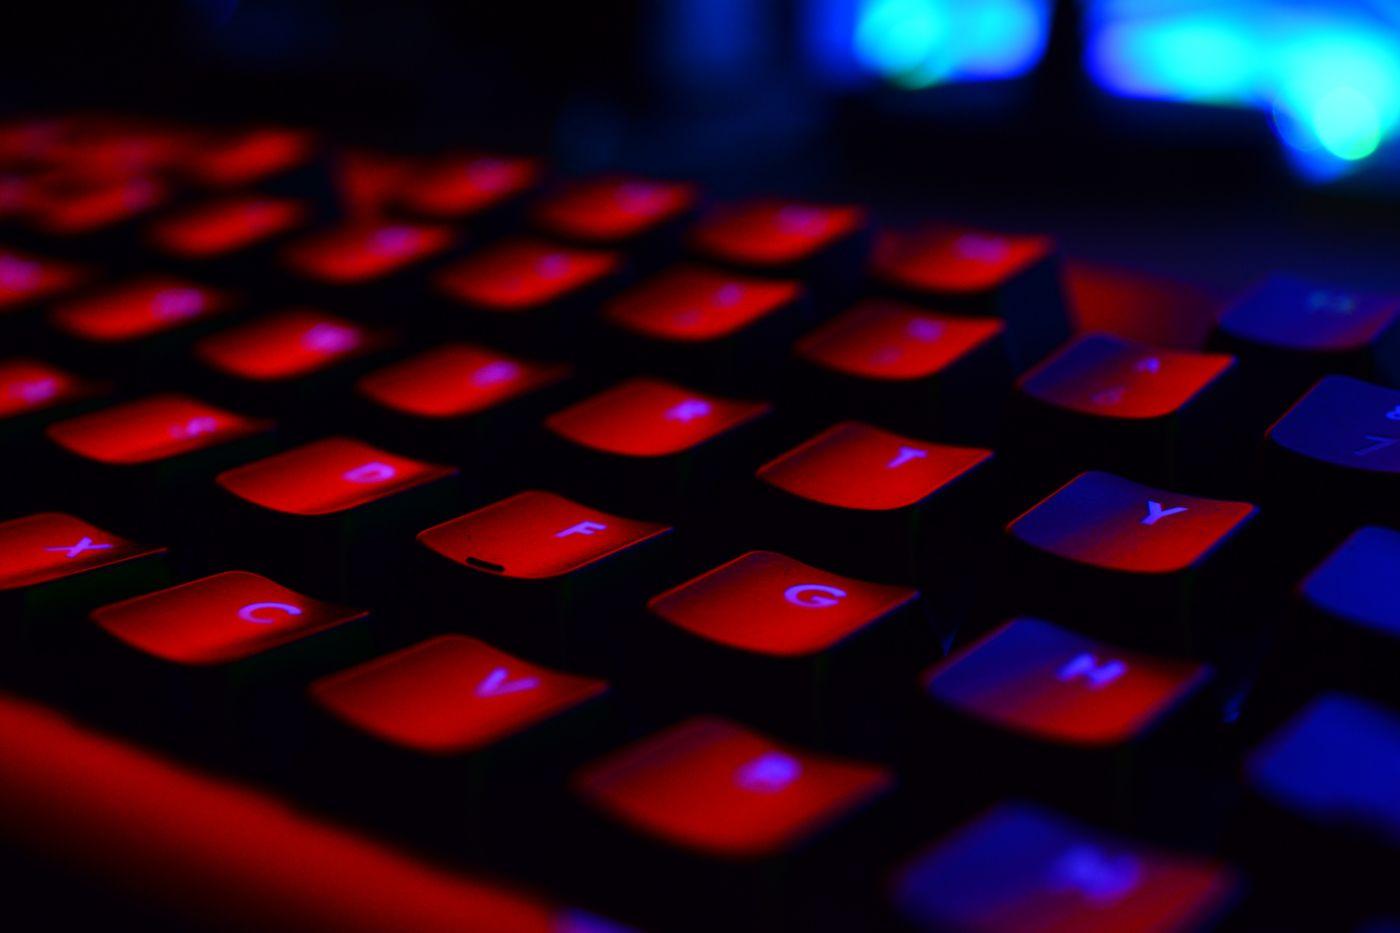 Black keyboard under red and blue lights